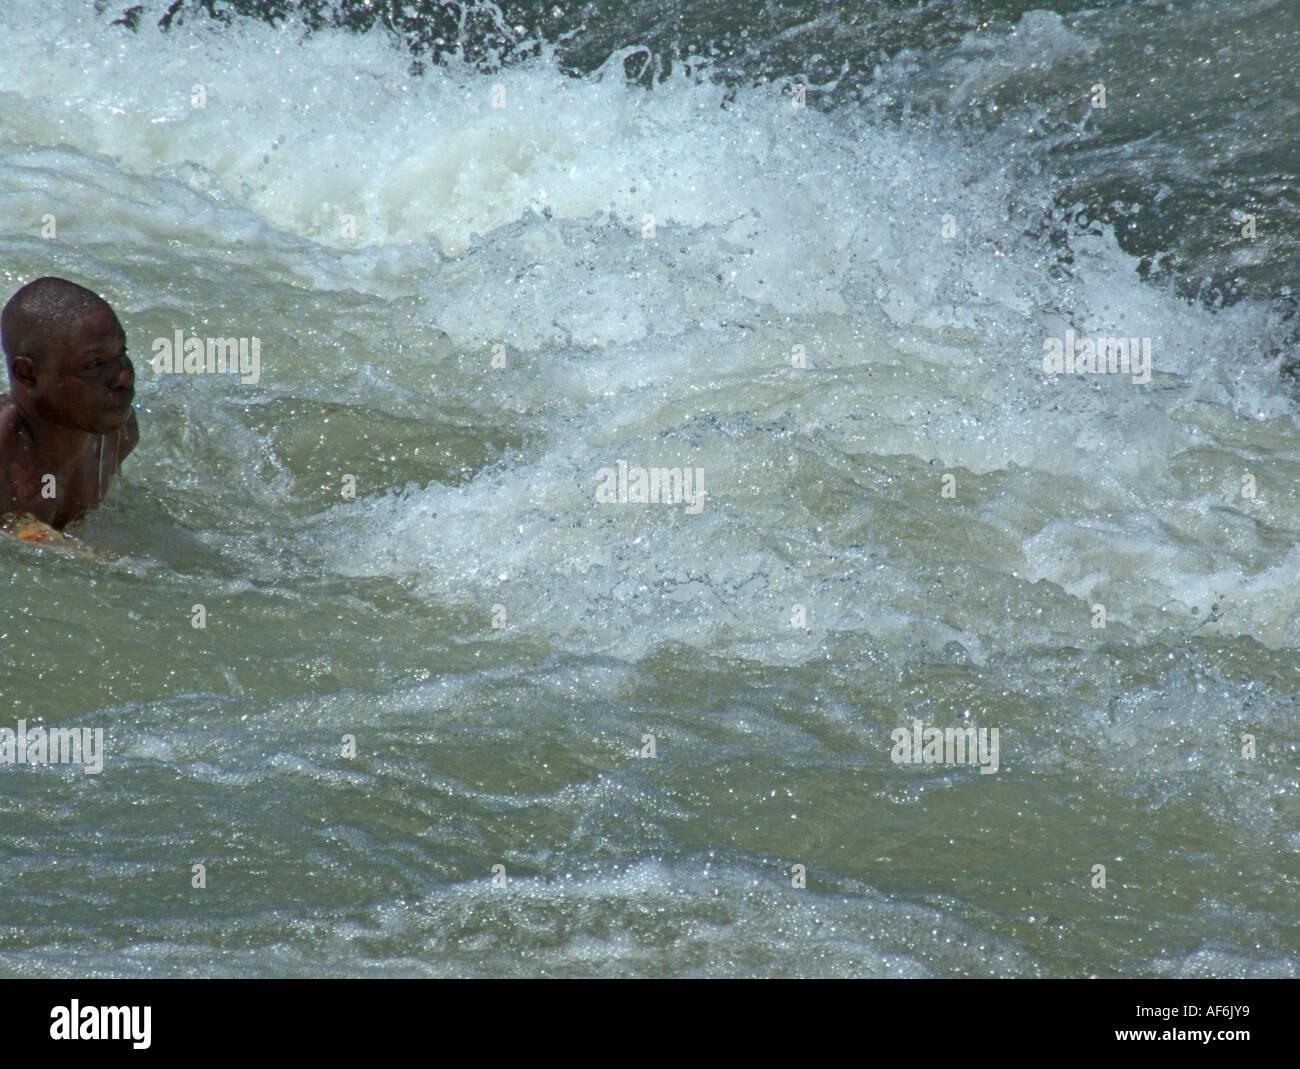 Daredevil braving the rapids at Bujjagali Falls near the source of the River Nile - Stock Image